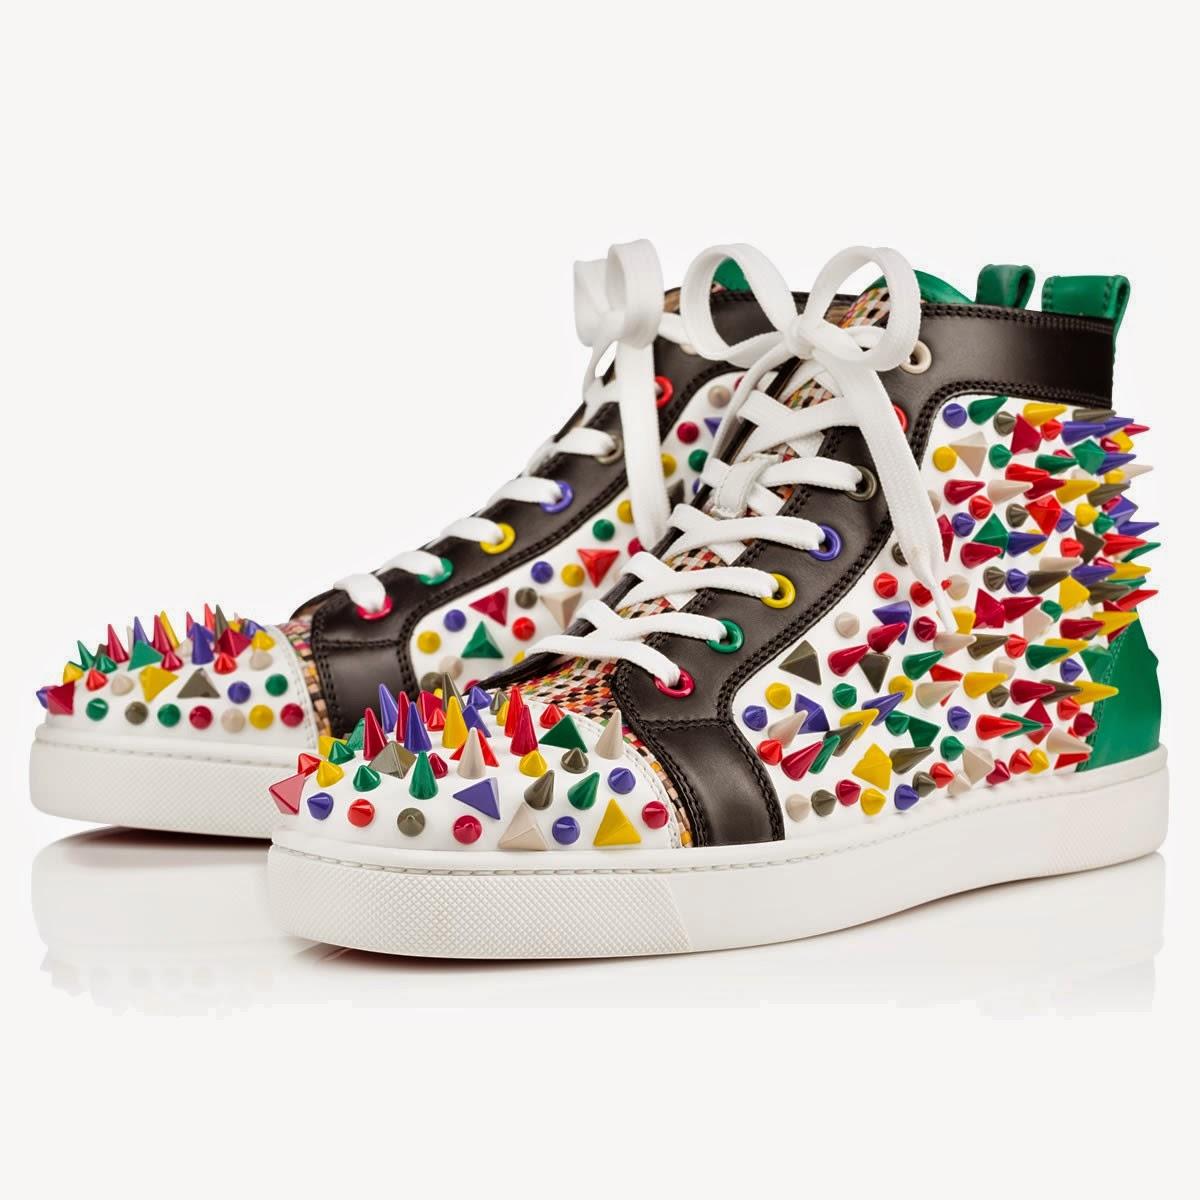 DIY-zapatillas-tunear-customizar-CHRISTIAN-LOUBOUTIN-zapatos-pinchos-esmaltes-pinta uñas-colores-2015